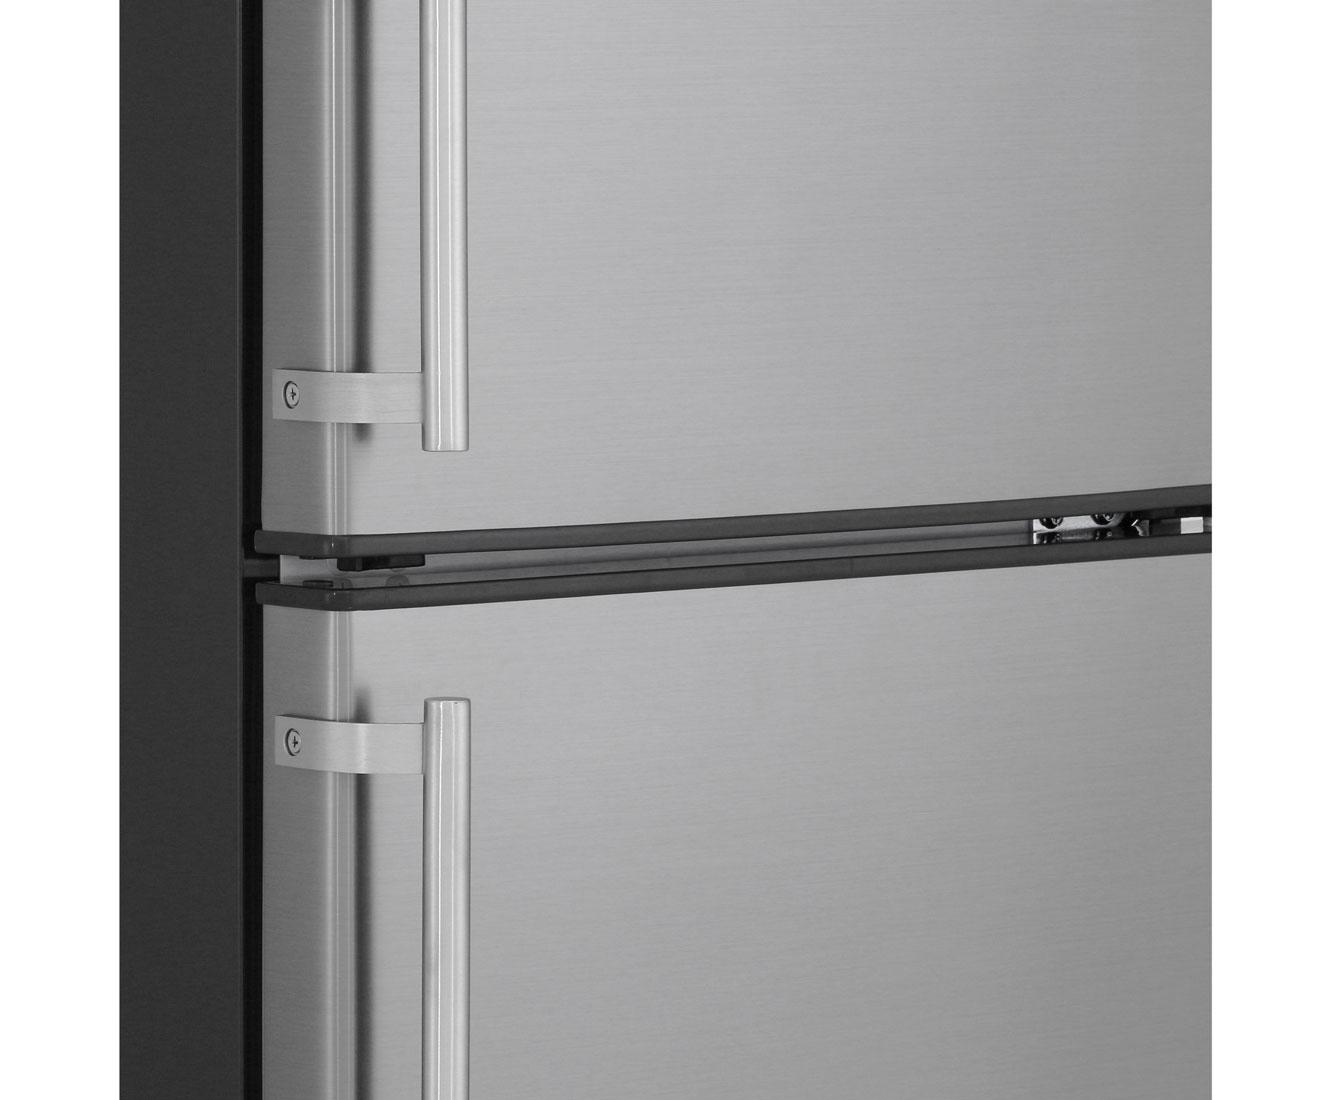 exquisit kgc 233 60 4 2 k hl gefrierkombination freistehend edelstahl optik neu ebay. Black Bedroom Furniture Sets. Home Design Ideas